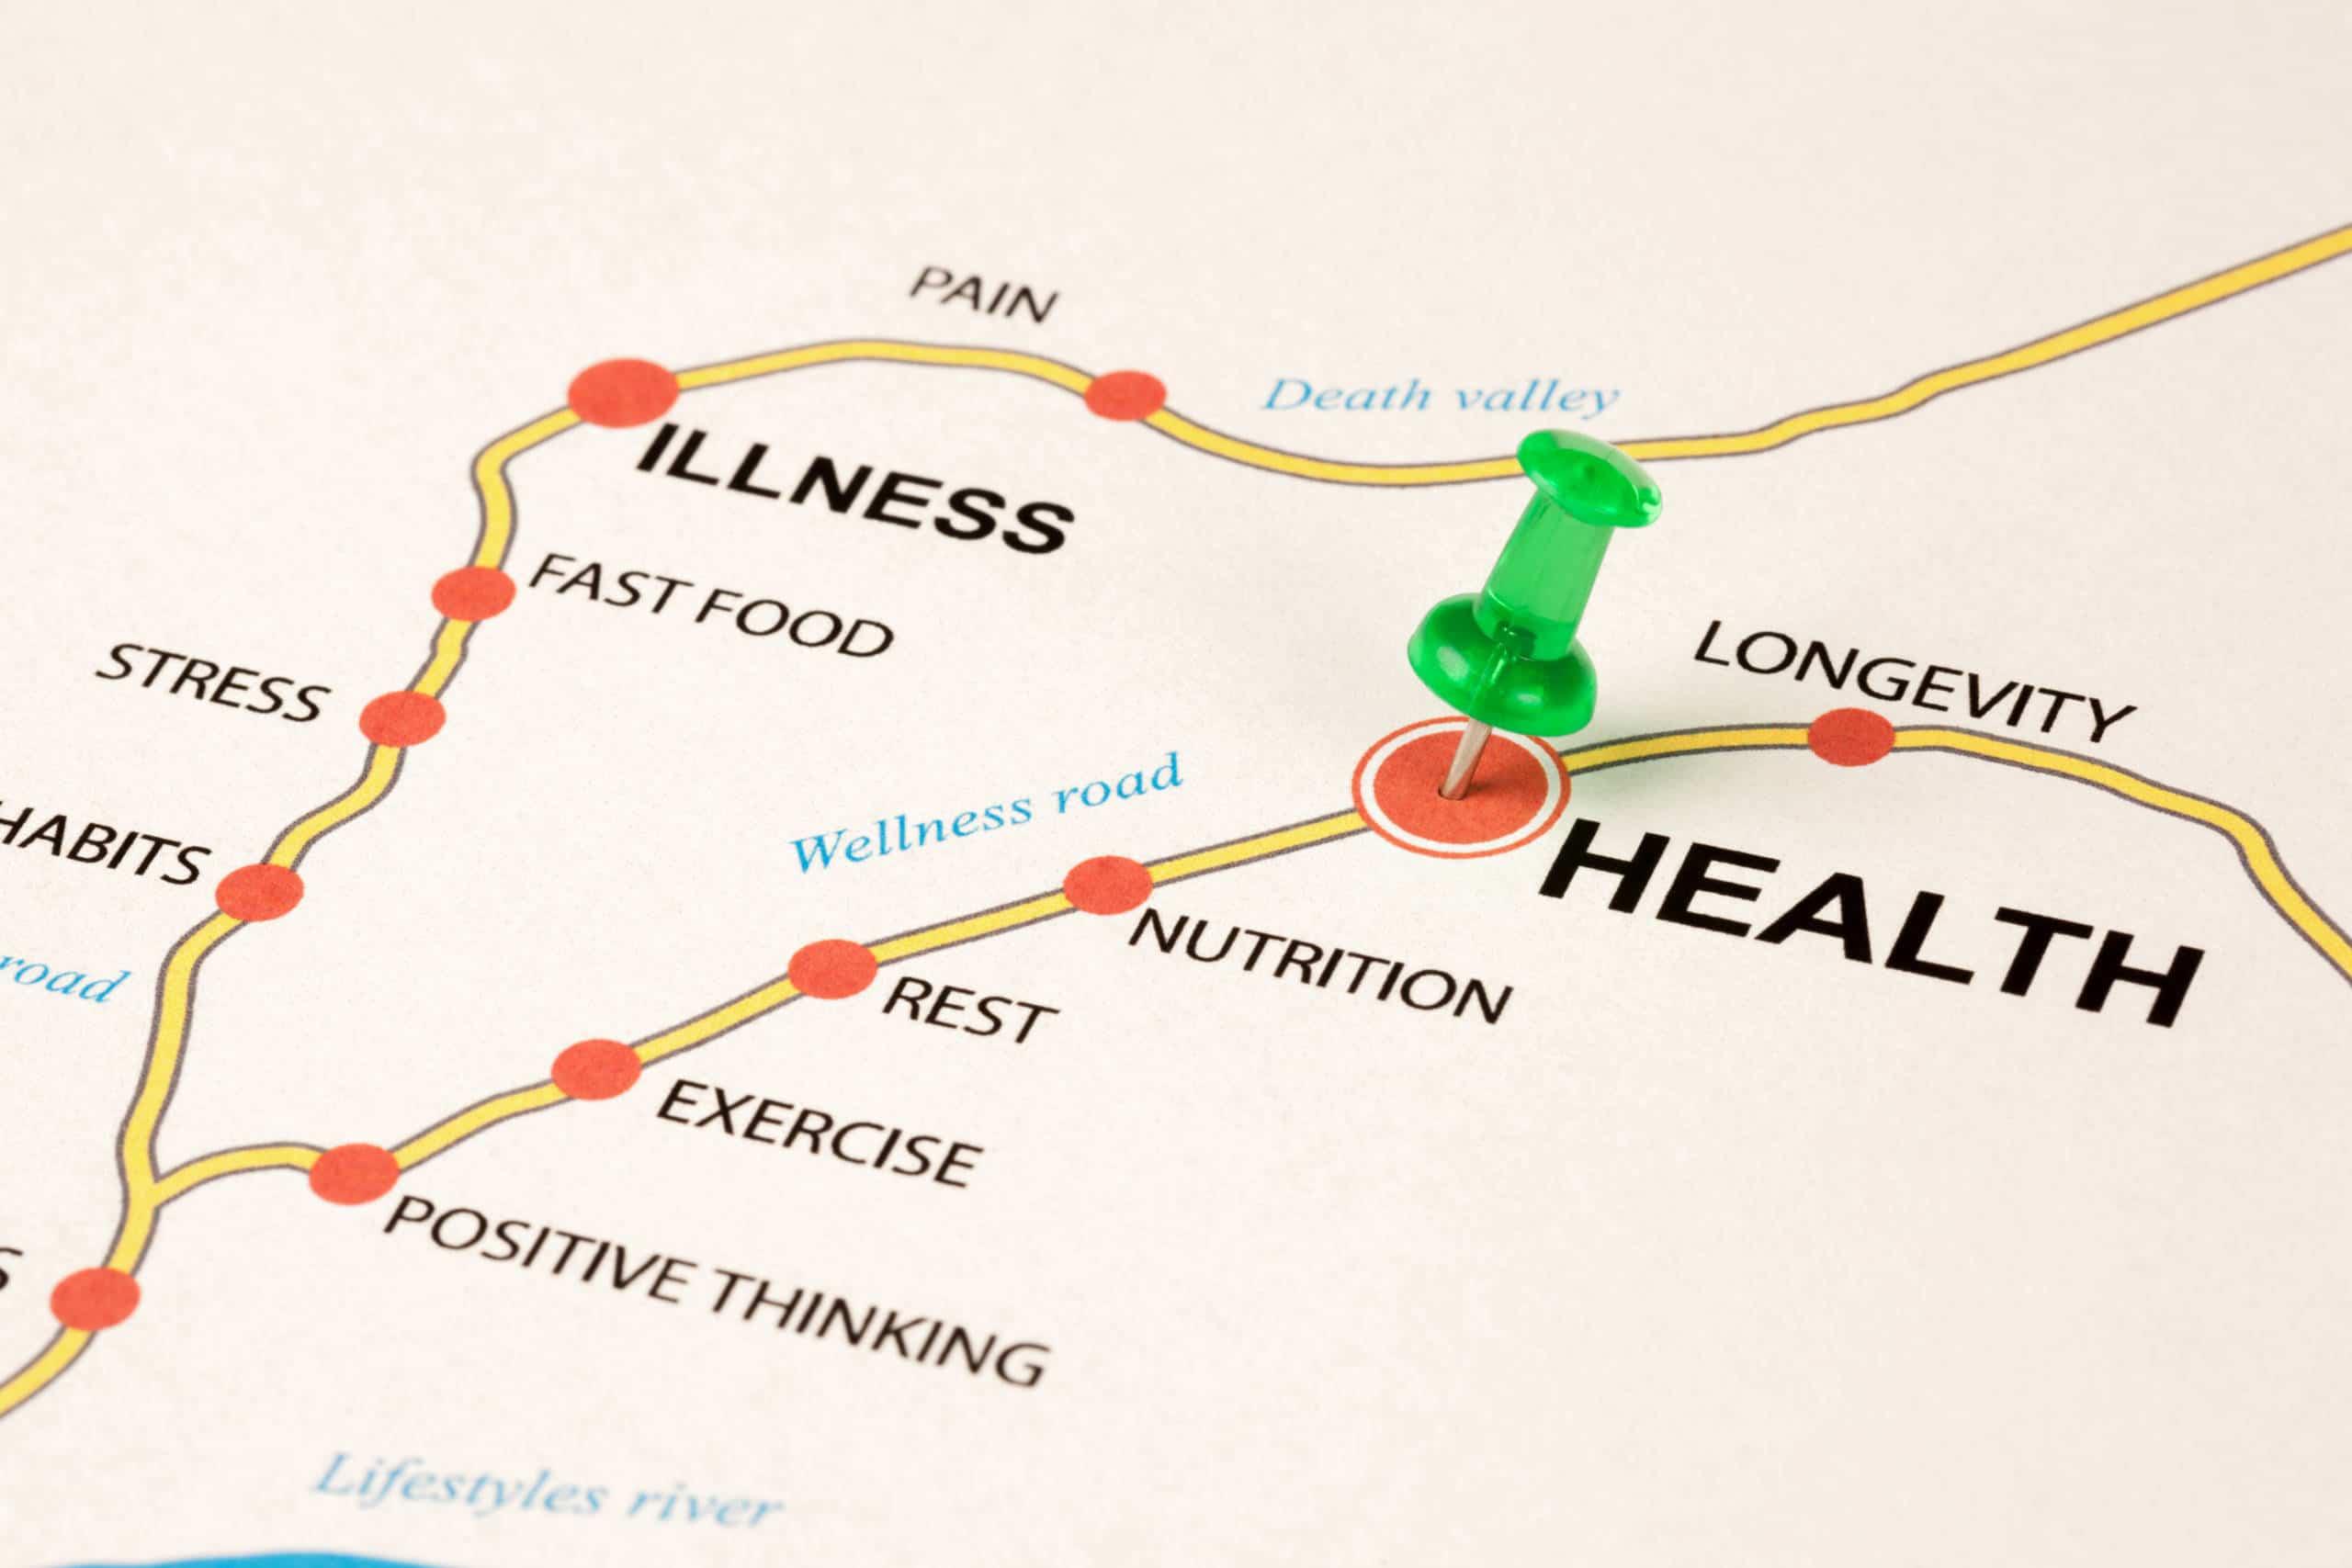 chronic diseases map graphic